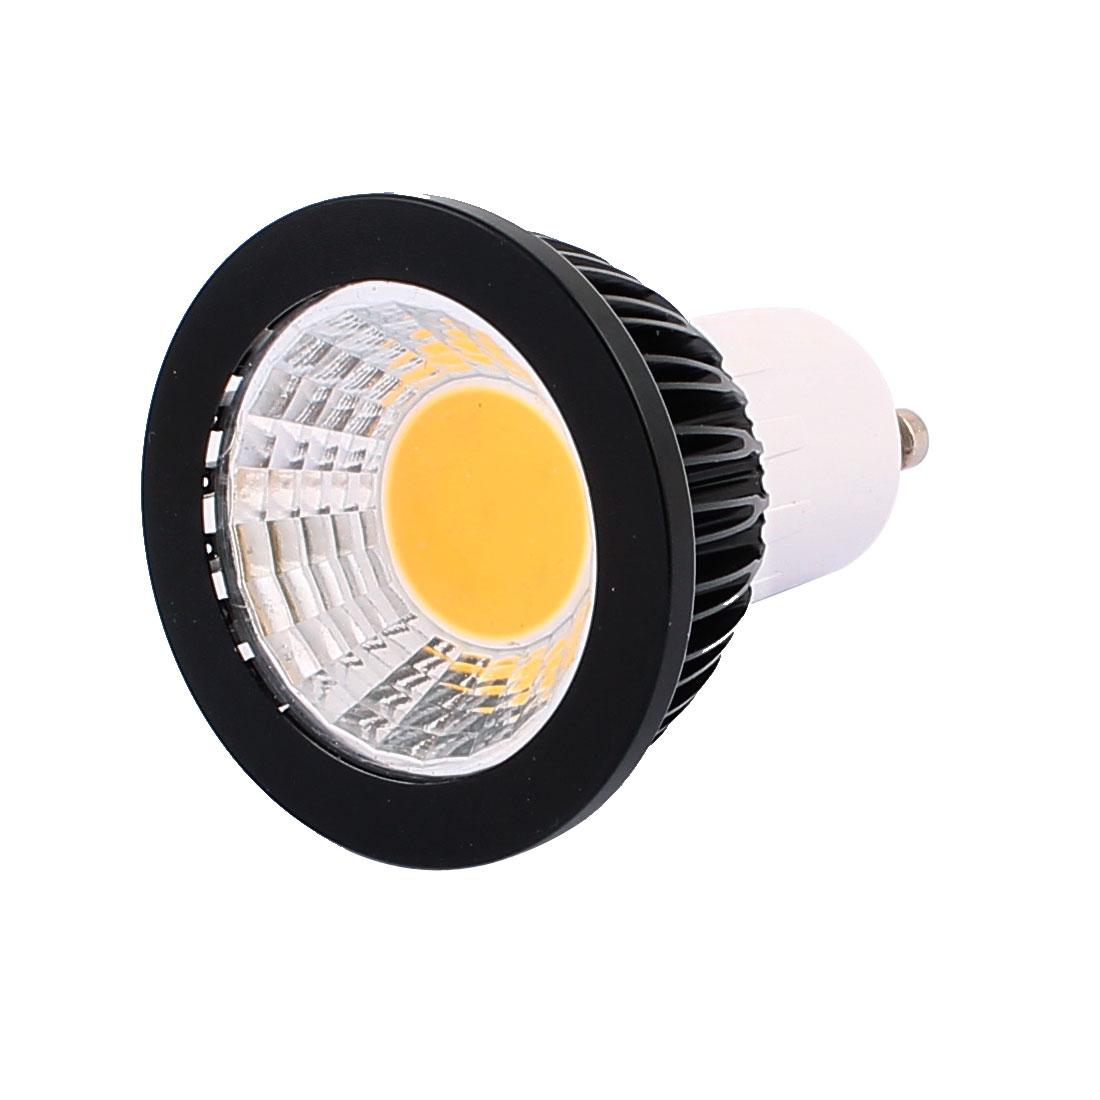 AC85-265V 3W Power GU10 Base COB LED Spotlight Bulb Downlight Warm White